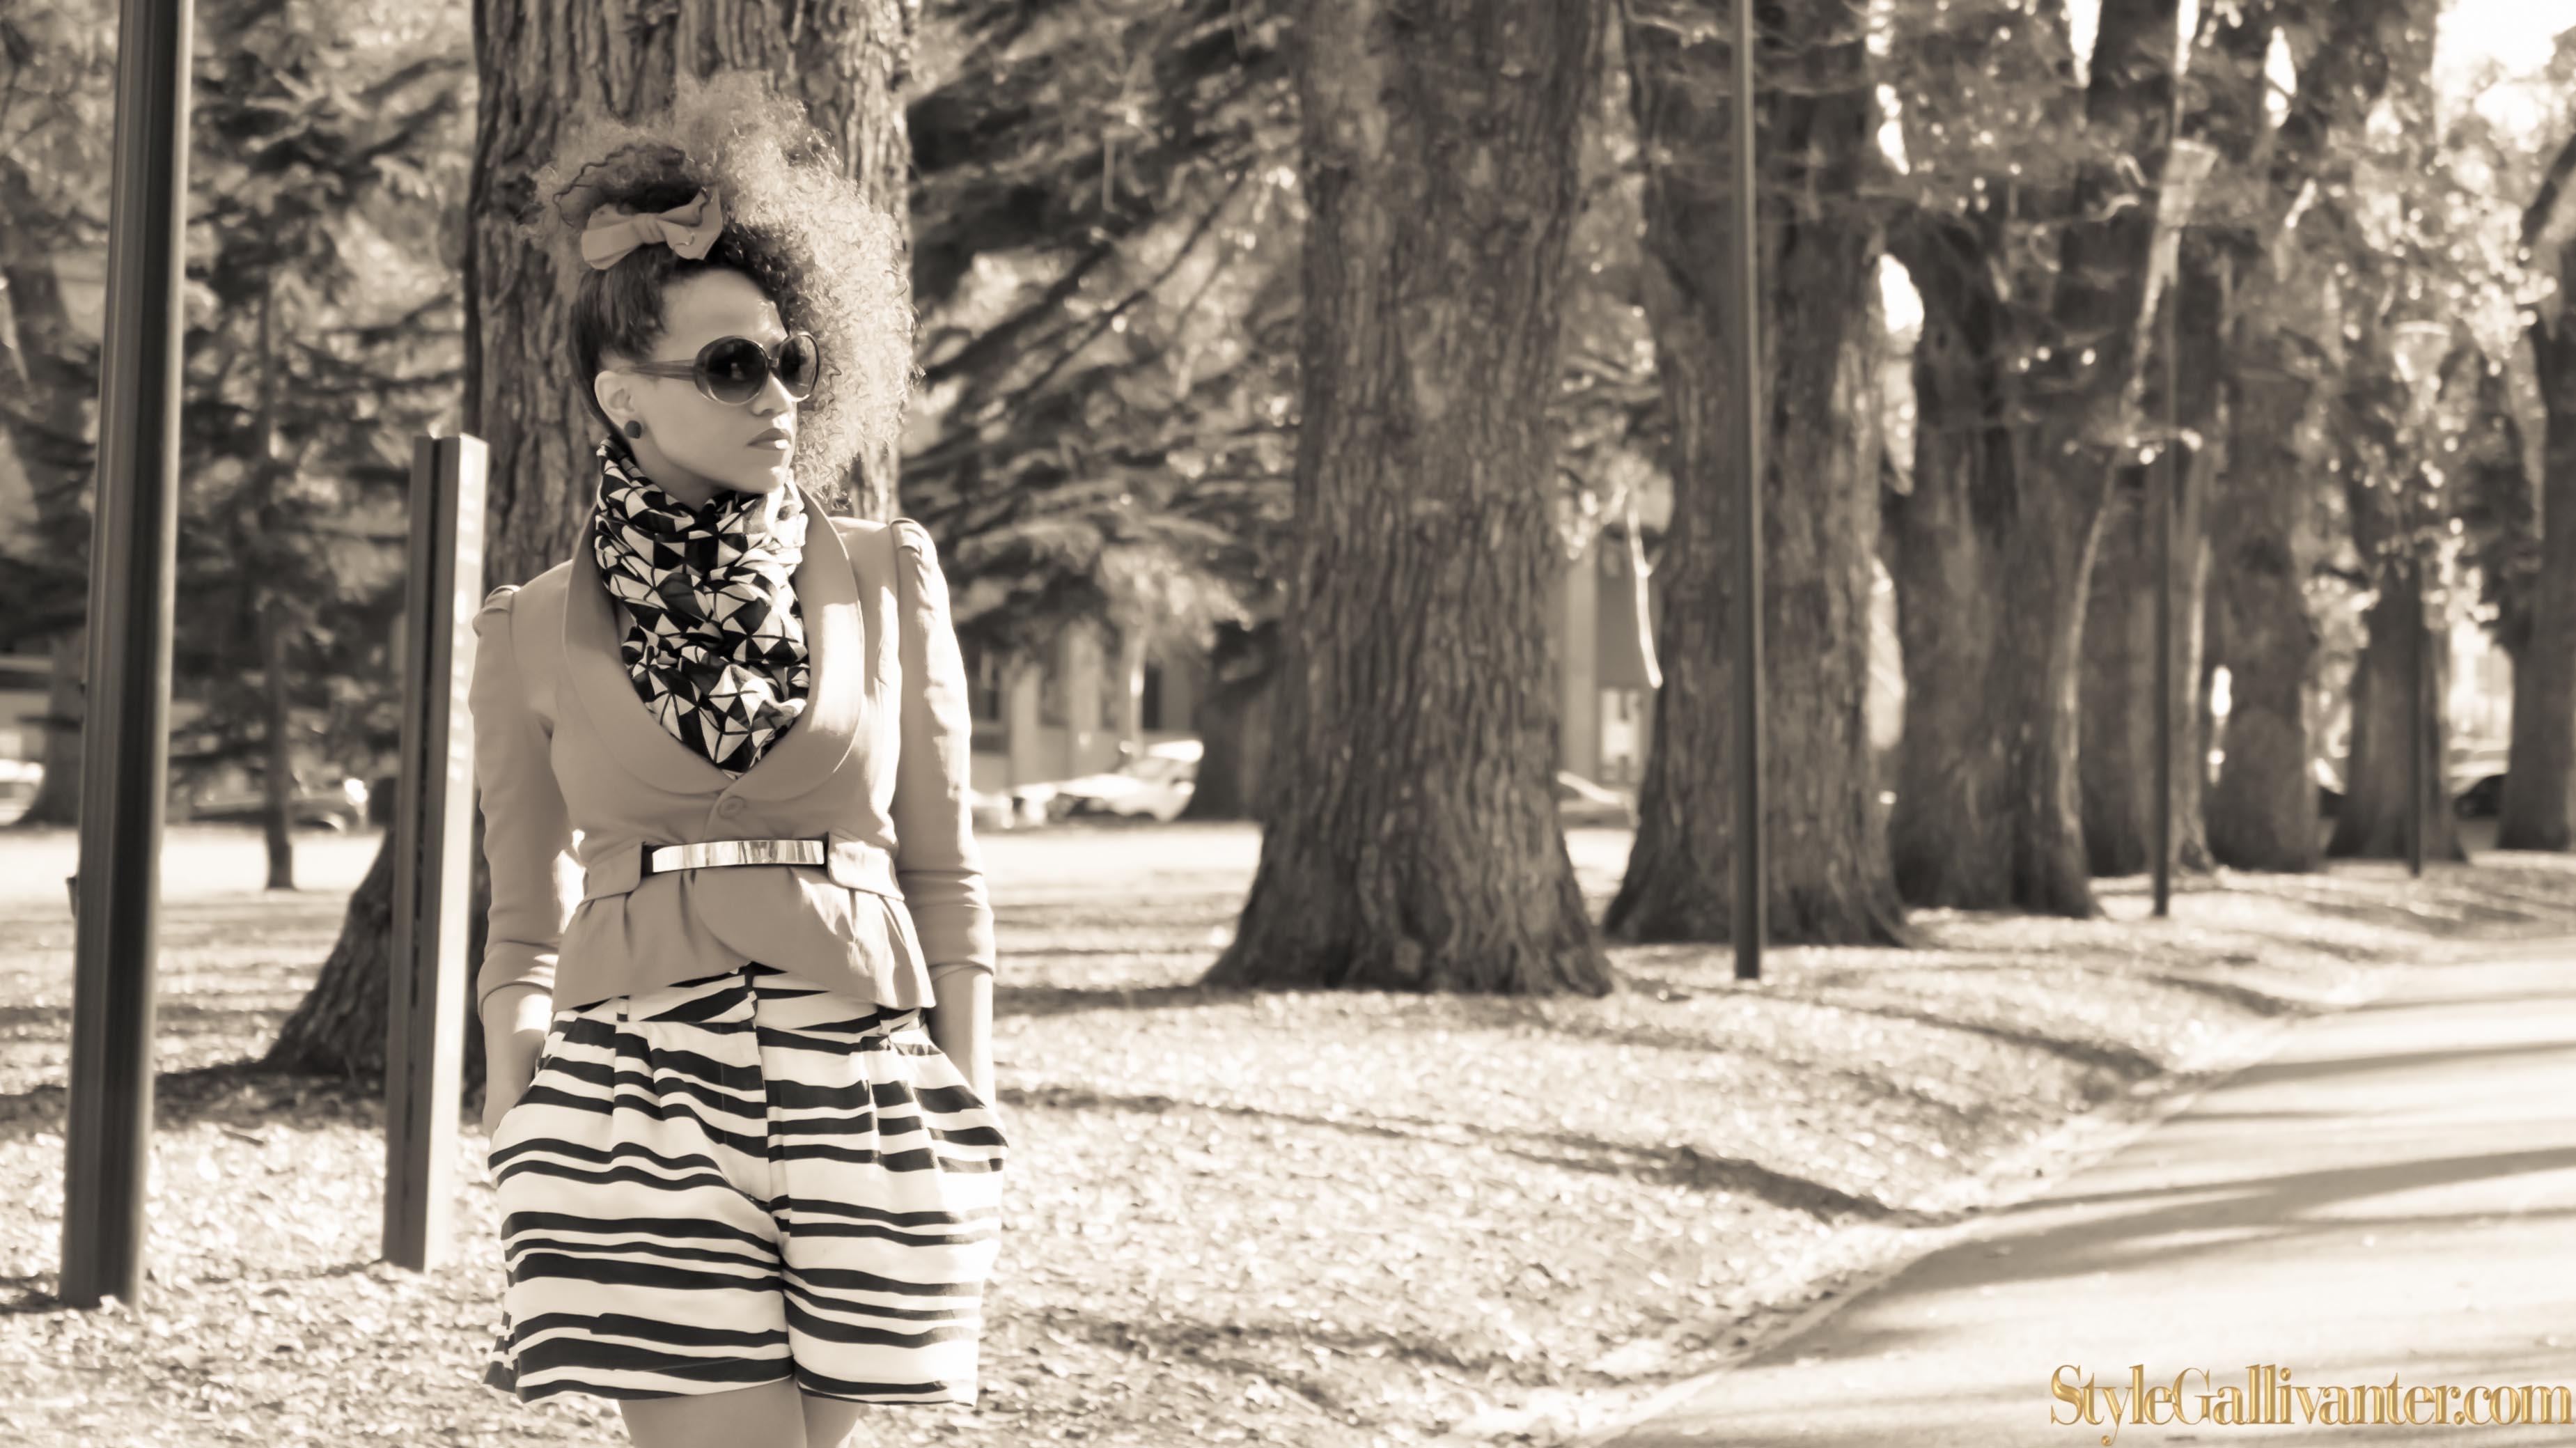 pregnant-fashion-bloggers-melbourne-australia_mummy-bloggers-melbourne_best-bump-models-australia_high-waisted-pants_print-clash-trend_monochrome-trend-2014_best-christian-fashion-bloggers